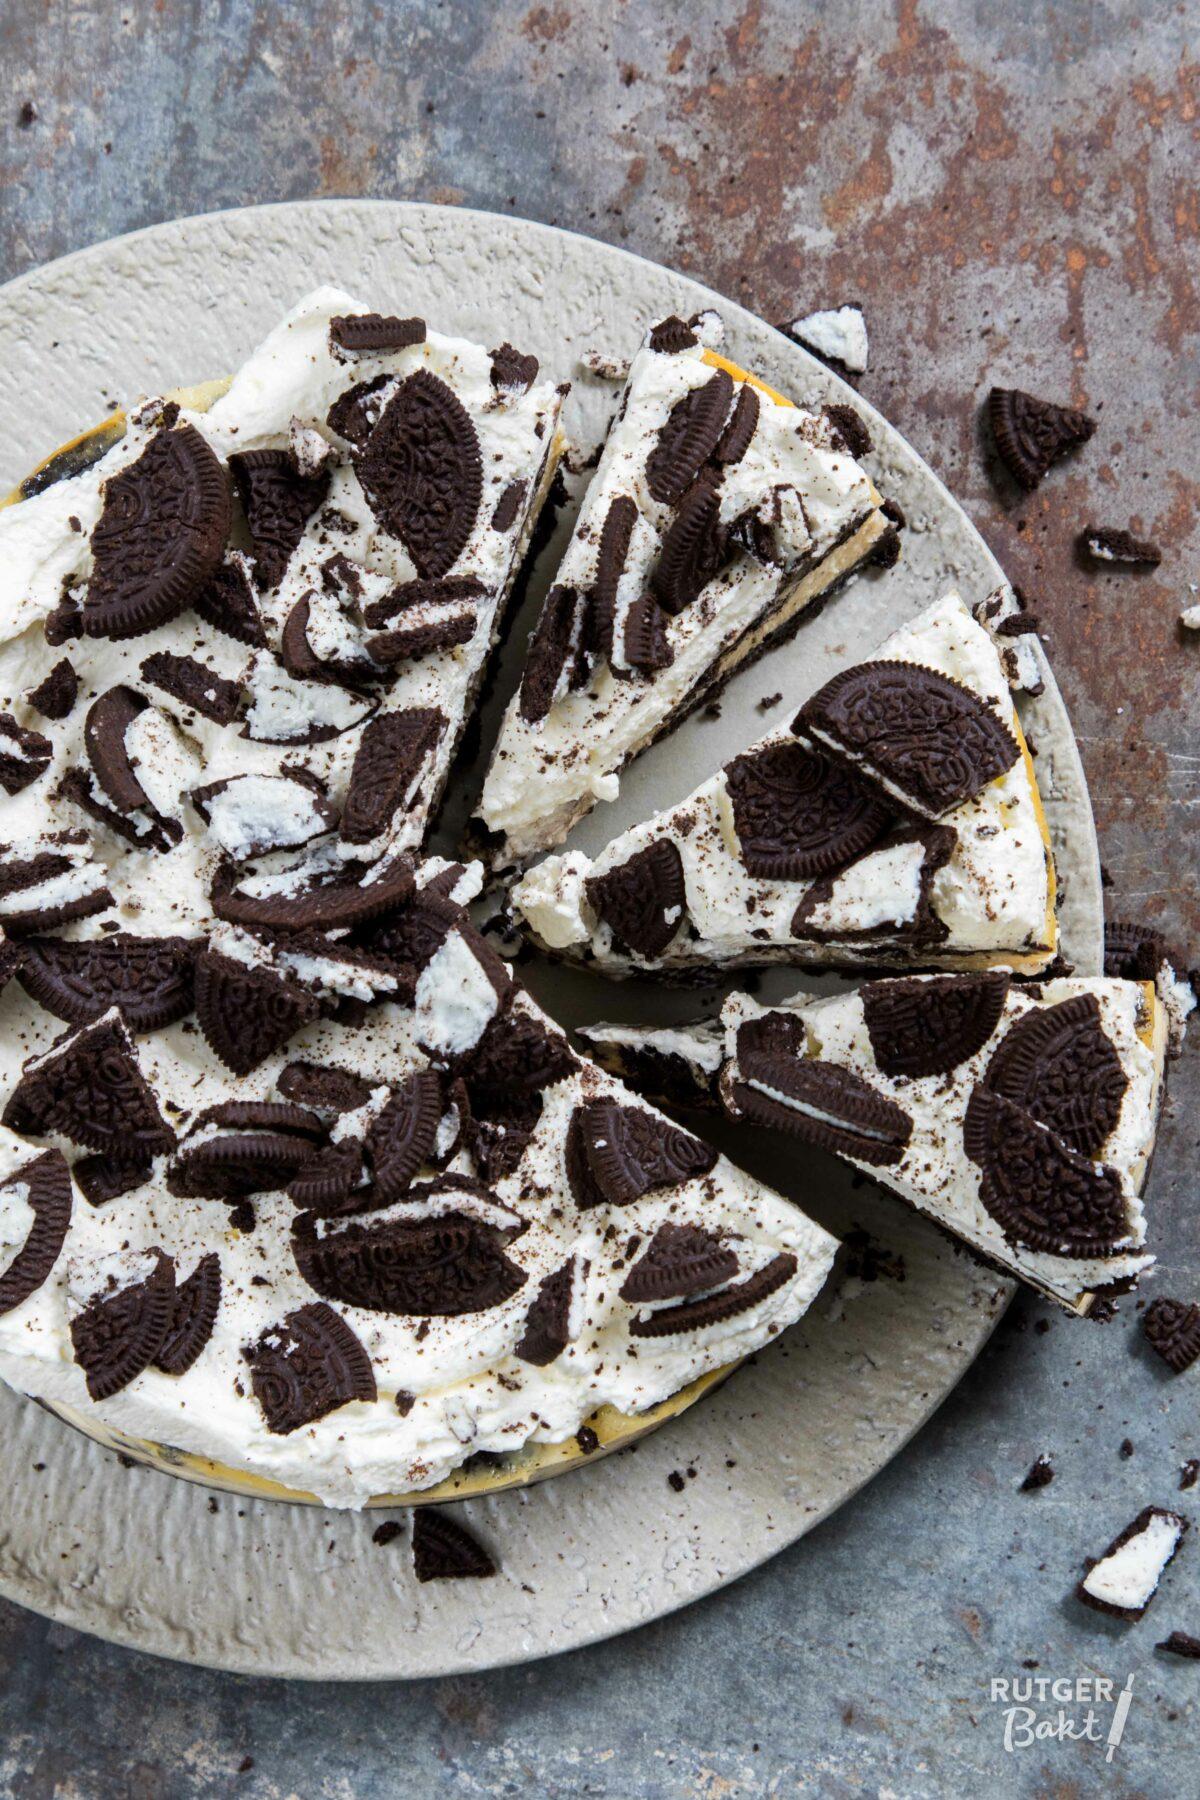 De lekkerste oreo cheesecake – recept